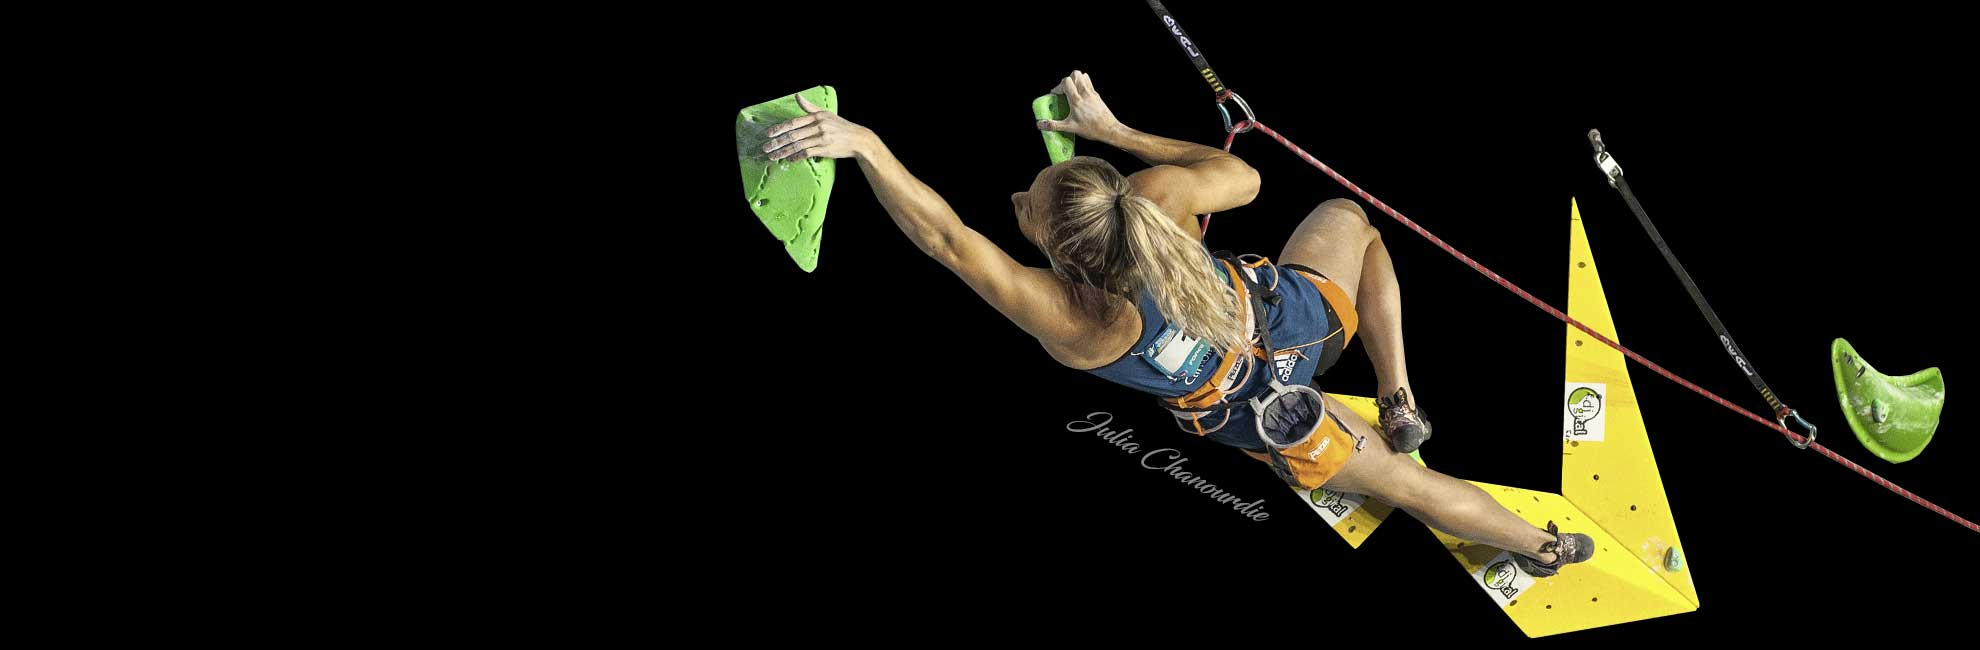 climbing holds cha